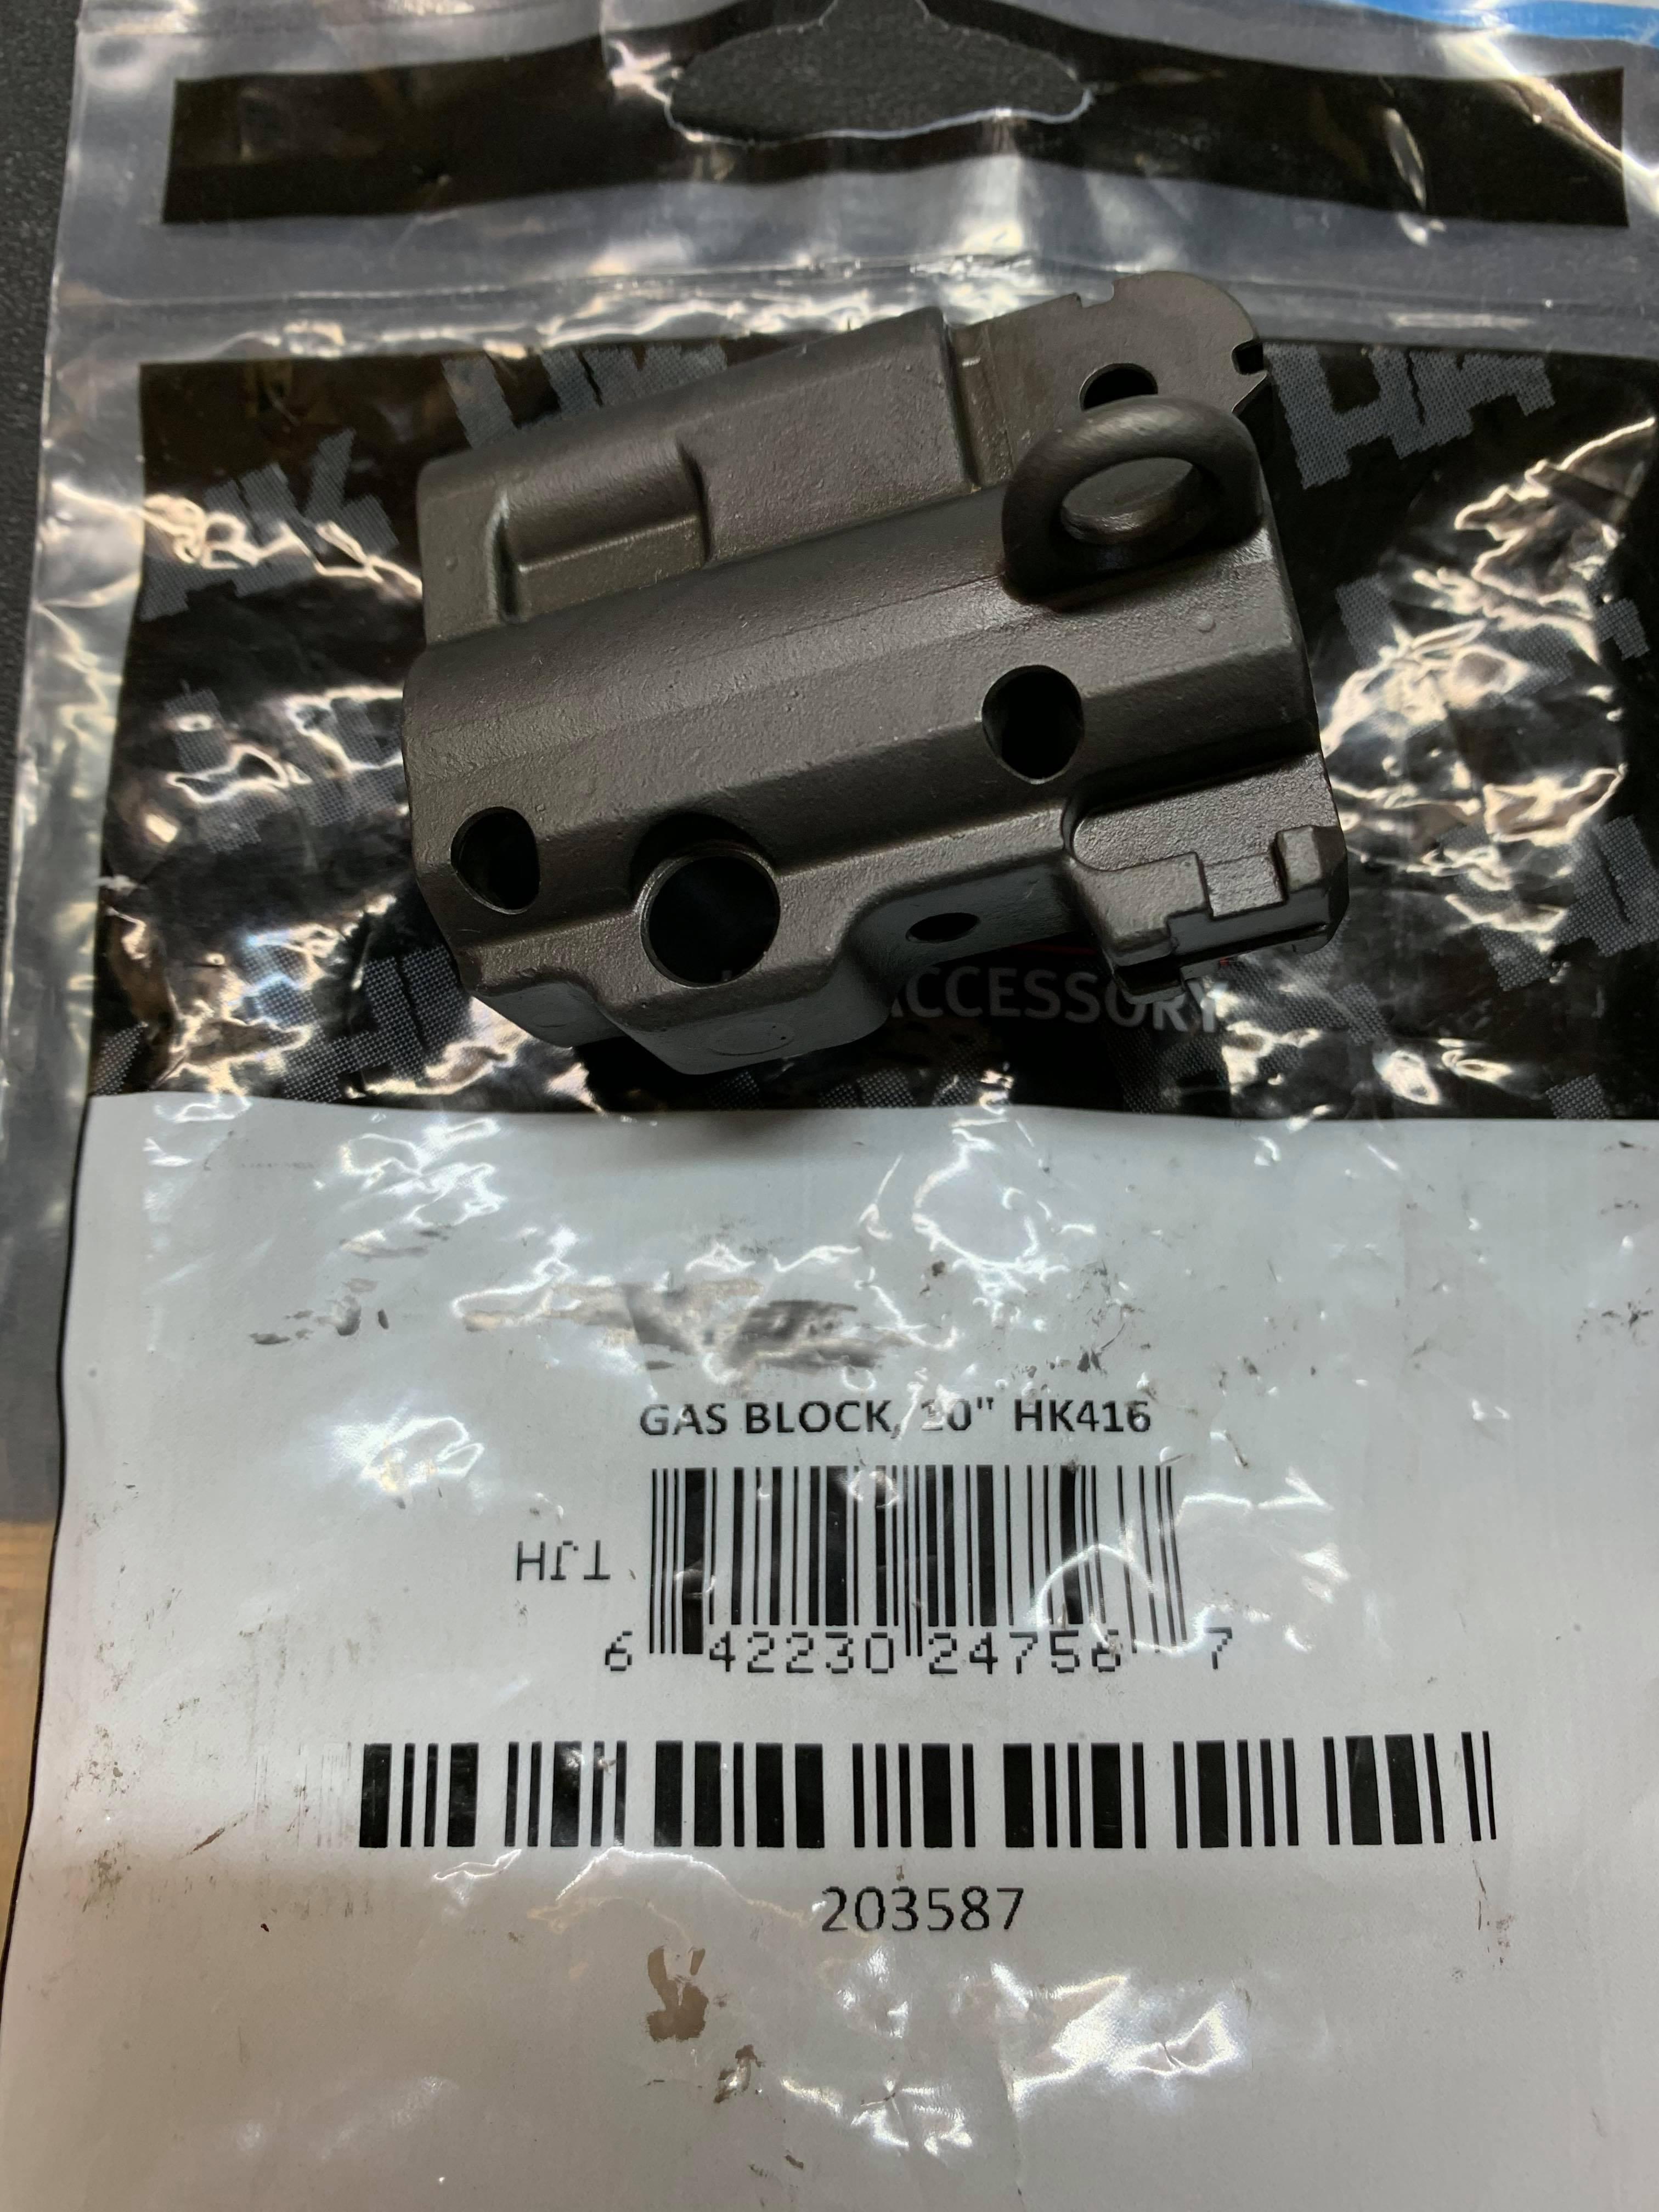 SOLD: HK factory non-vented 10.4 gas block-83597800_1337887369736508_7553450225085533558_n.jpg